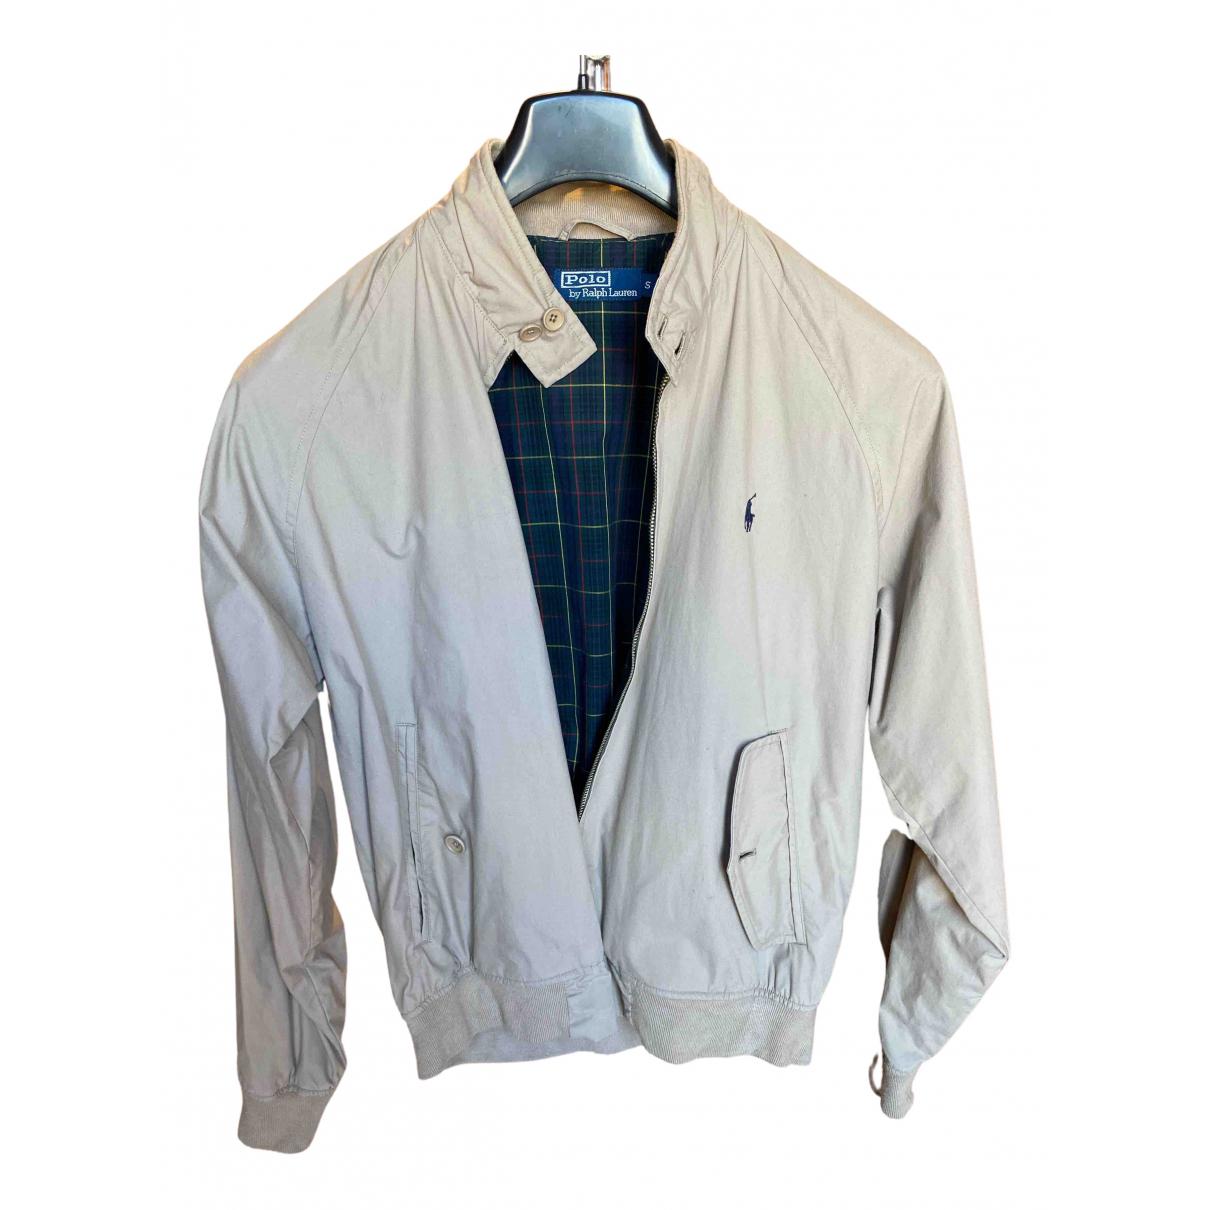 Polo Ralph Lauren N Beige Cotton jacket  for Men S International